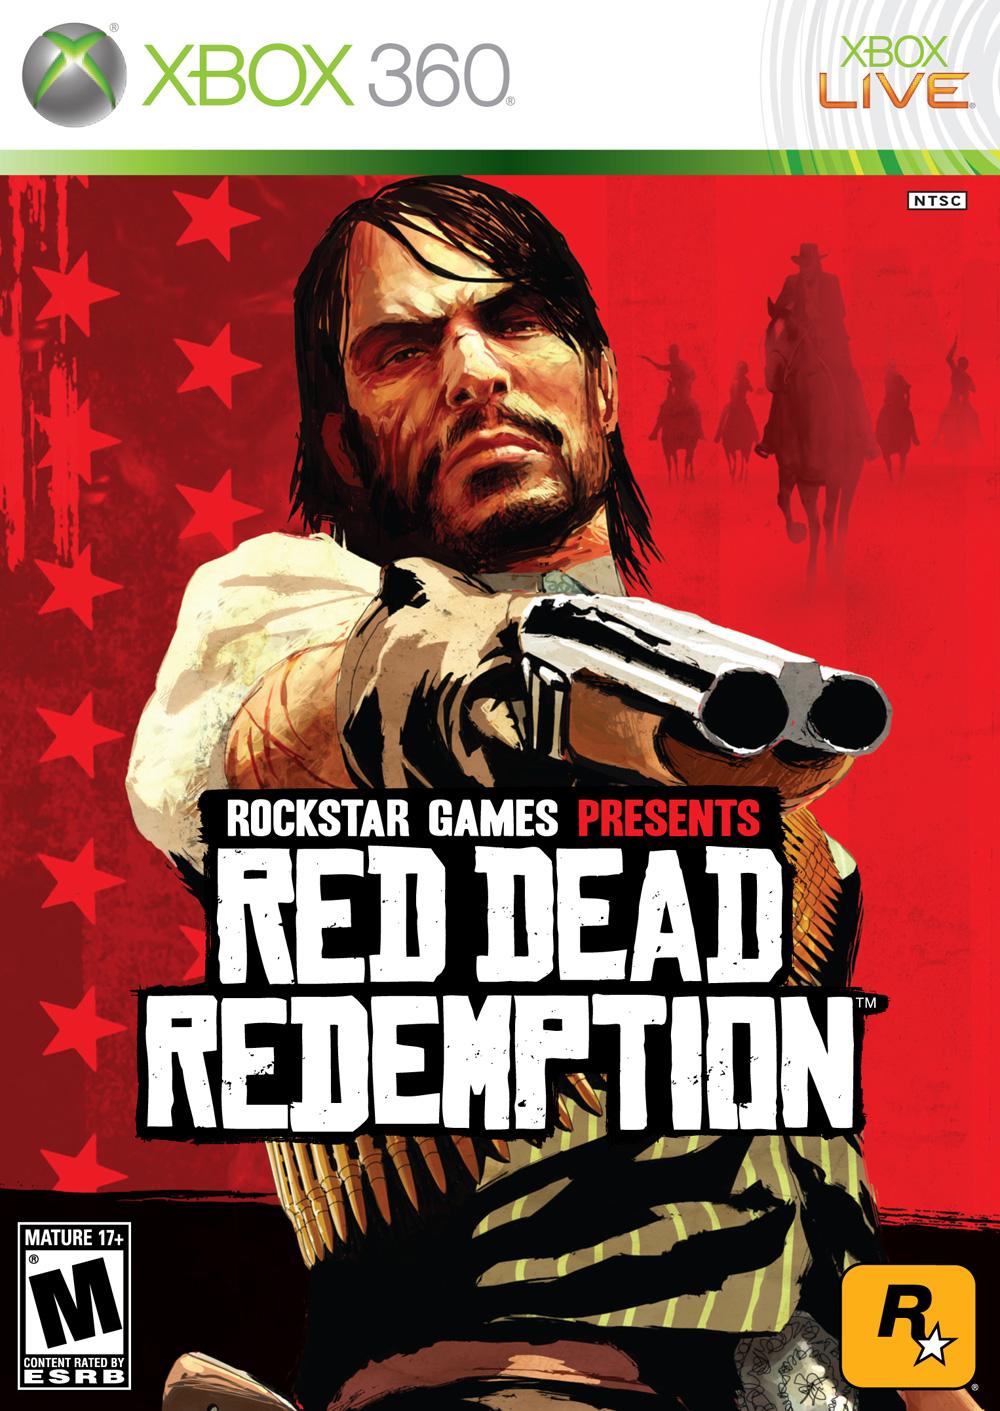 Red Dead Redemption - [XBOX-360] [RF] DOWNLOAD TORRENT - Super ... Baixar Jogo Fuse Xbox on xbox 360 android, xbox 360 wallpapers, xbox 360 facebook, xbox 360 juegos, xbox 360 windows, xbox 360 internet, xbox 360 google, xbox 360 mmorpg, xbox 360 racing games, xbox 360 series, xbox 360 gam, xbox 360 pc, xbox 360 gry, xbox 360 hardware, xbox 360 software, xbox 360 home, xbox 360 online, xbox 360 gow, xbox 360 brasil, xbox 360 spiele,